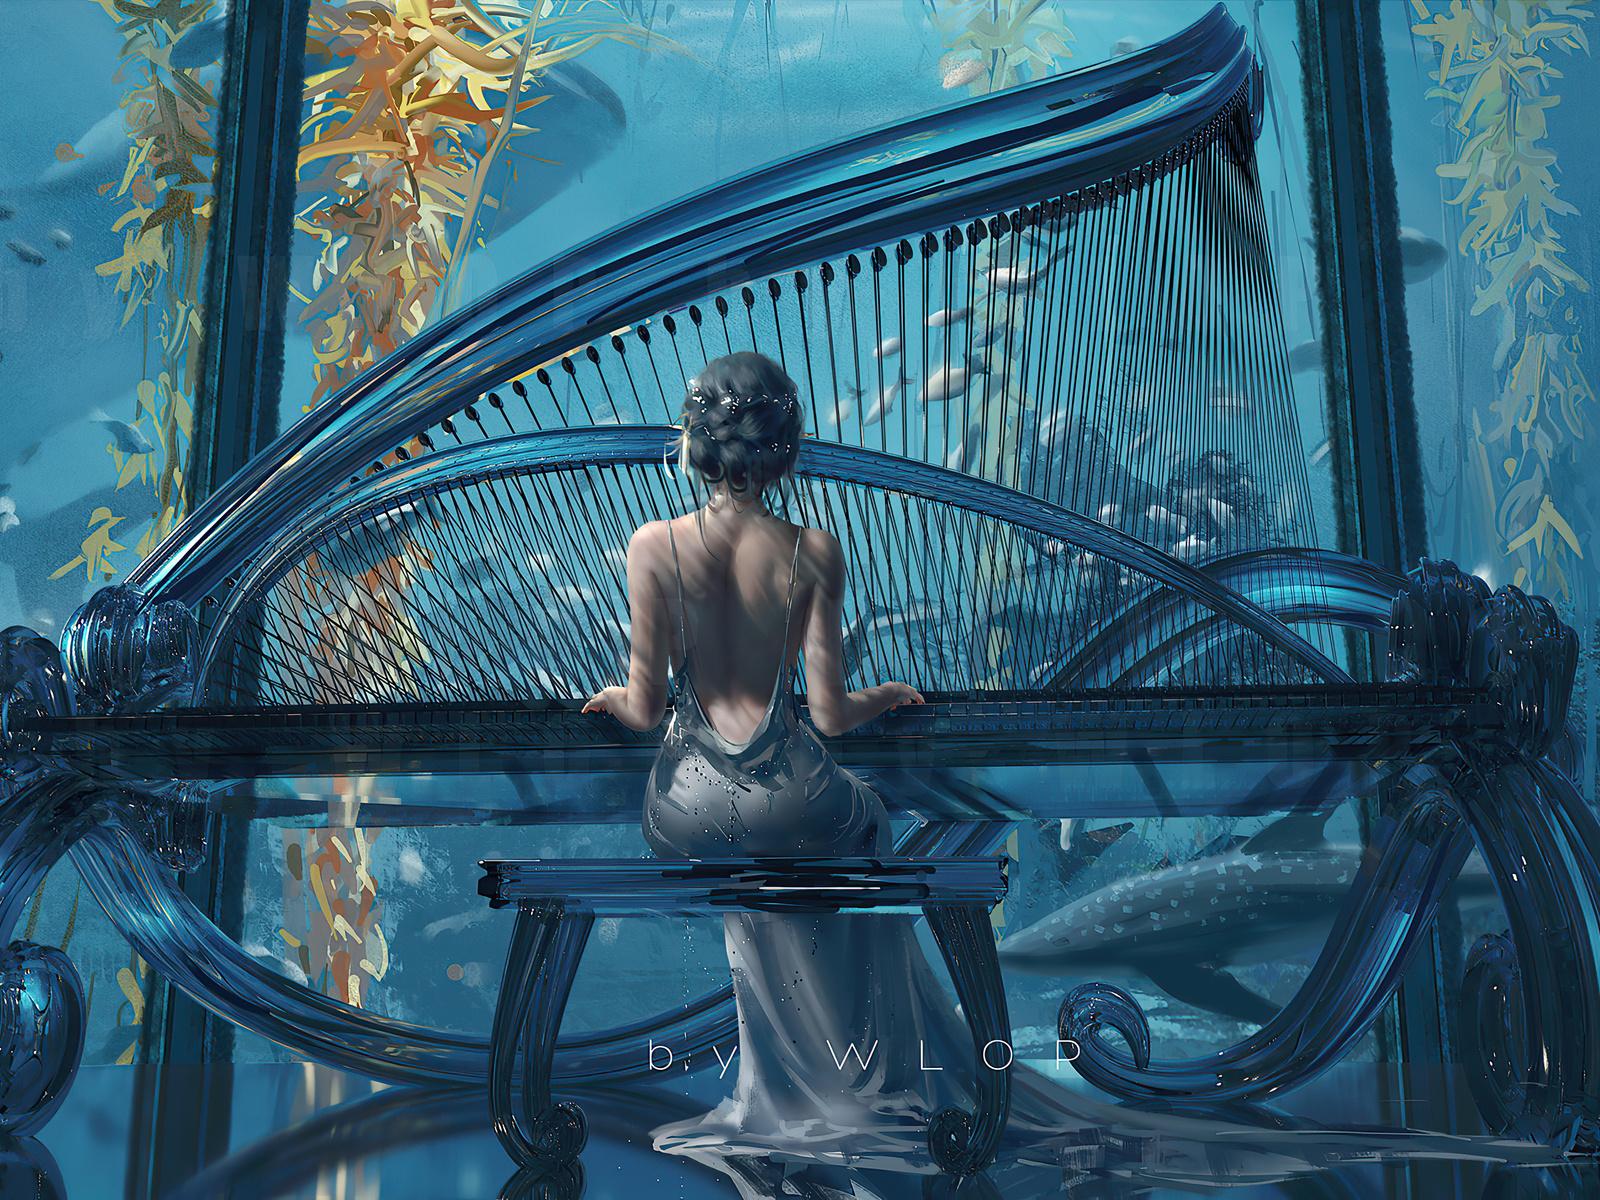 artwork, classic, piano, girl